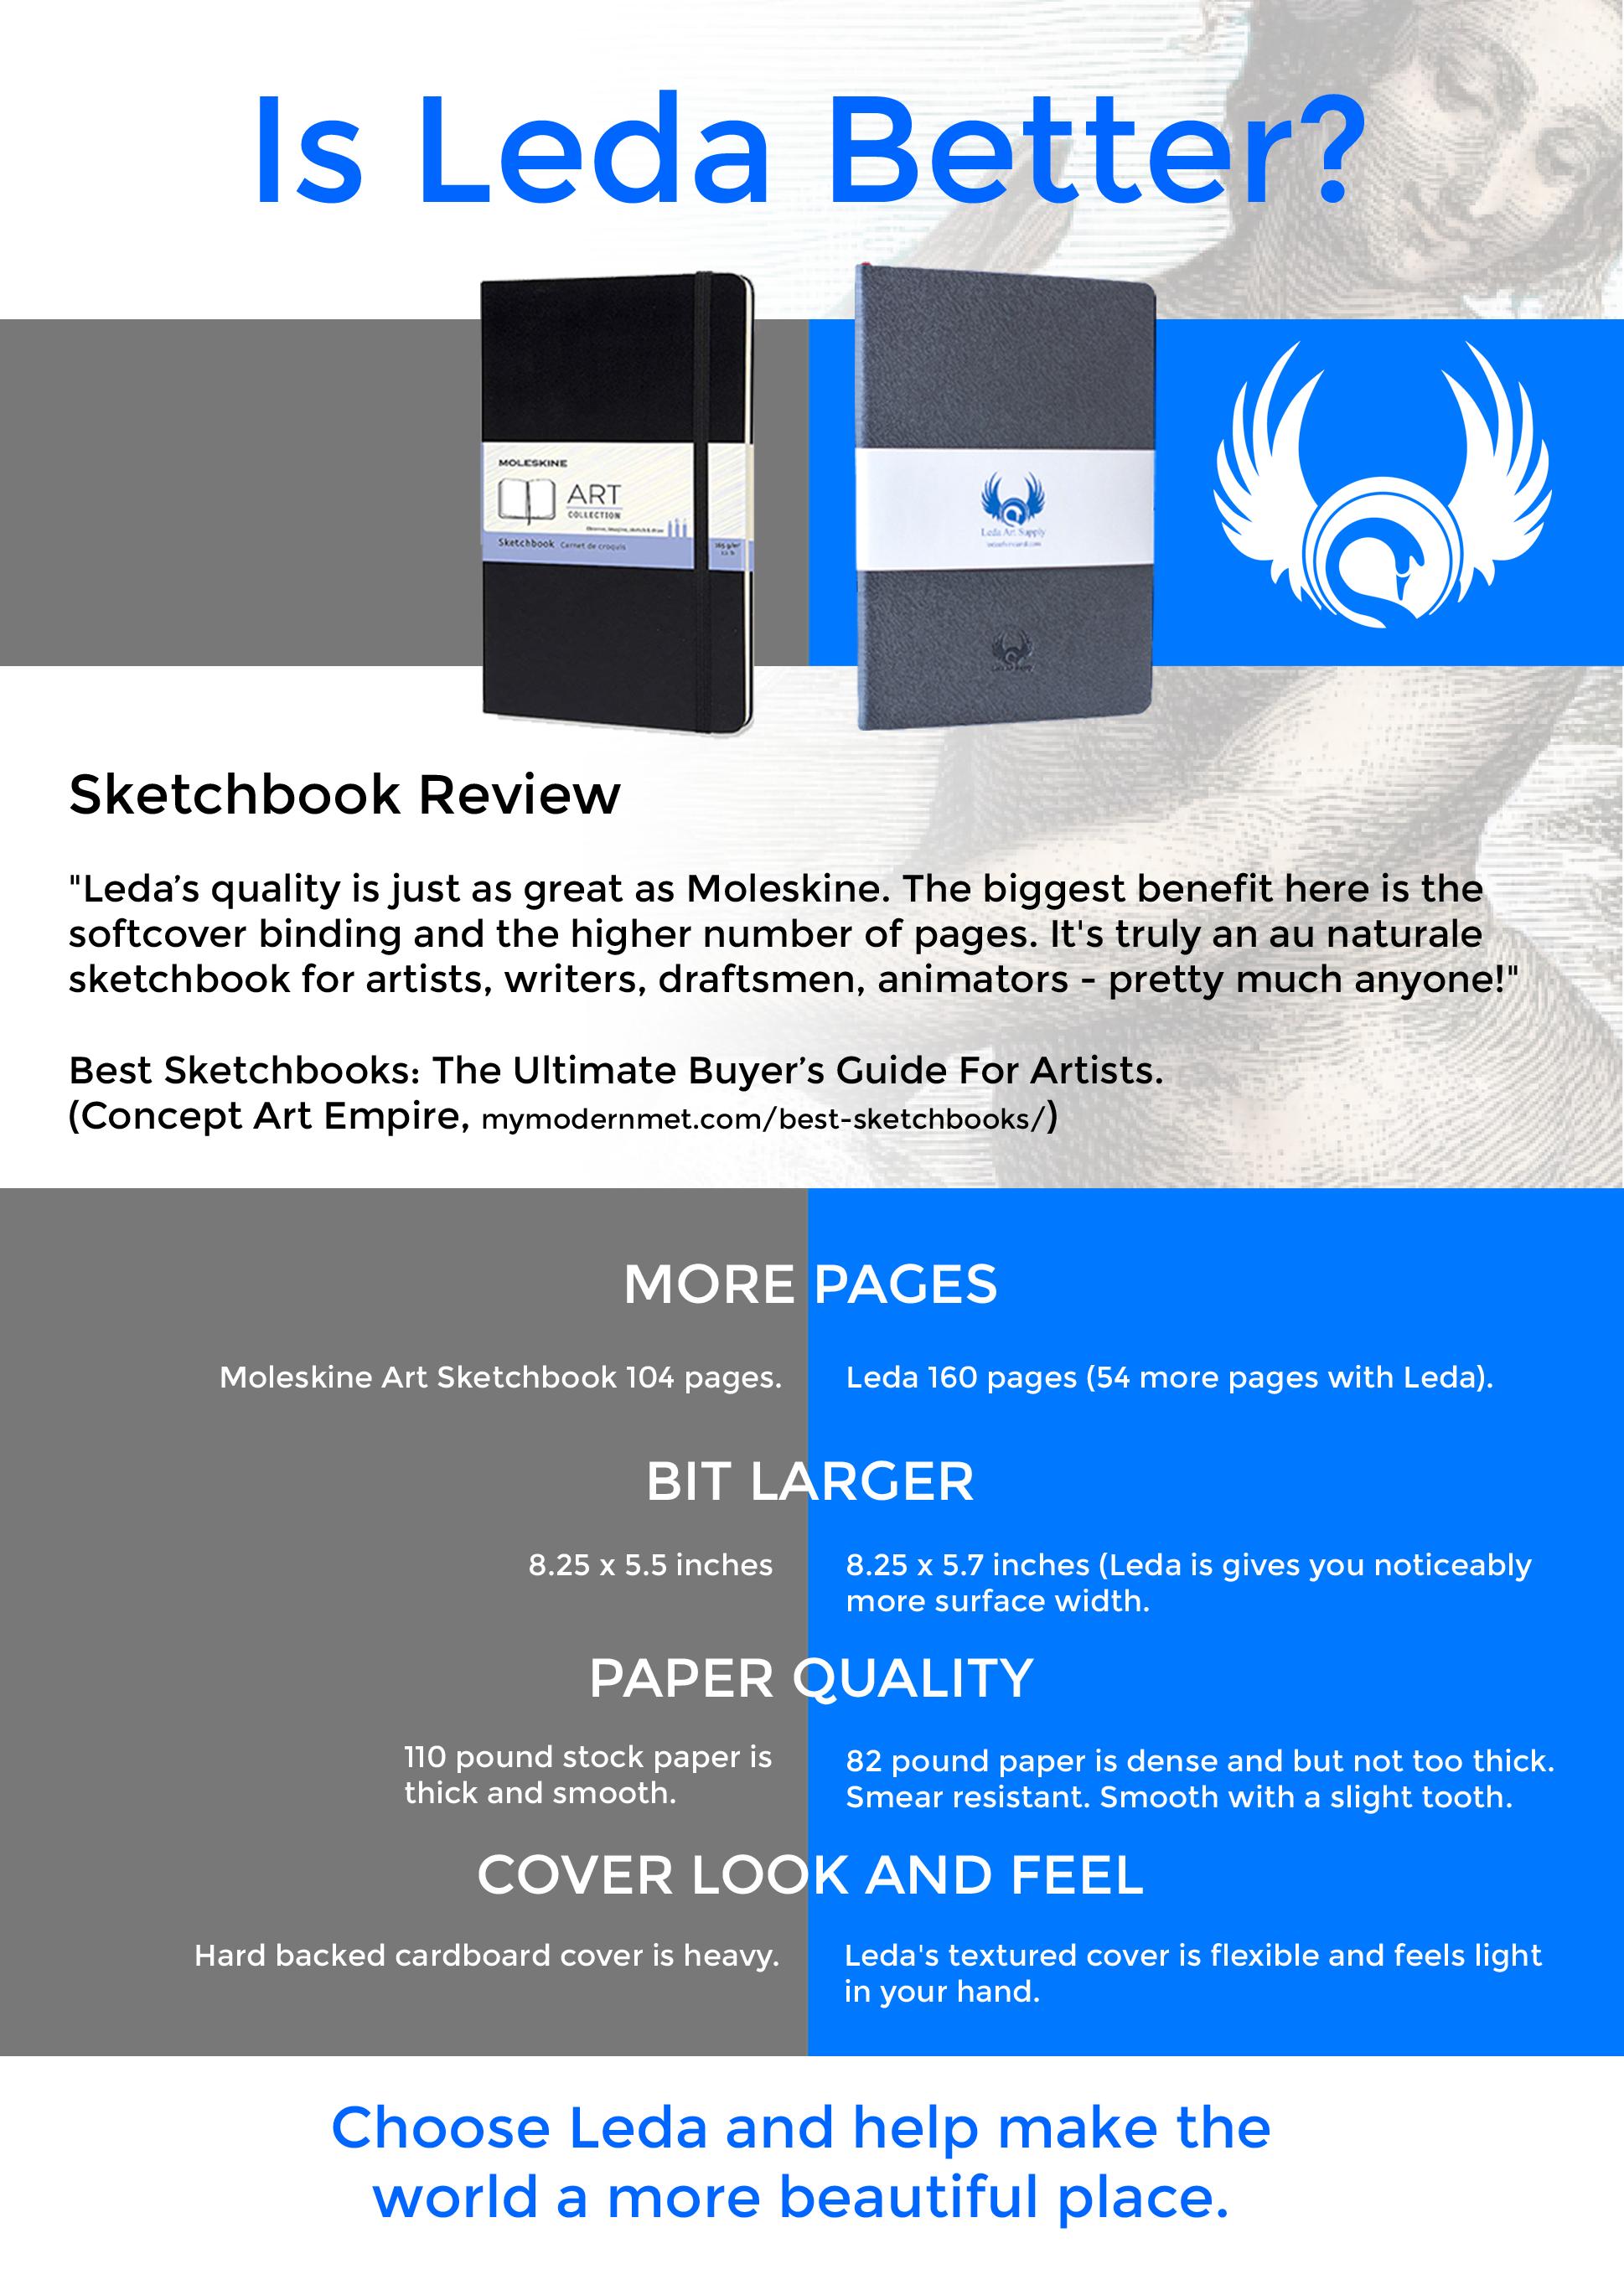 Leda vs Moleskine graphic, other graphics